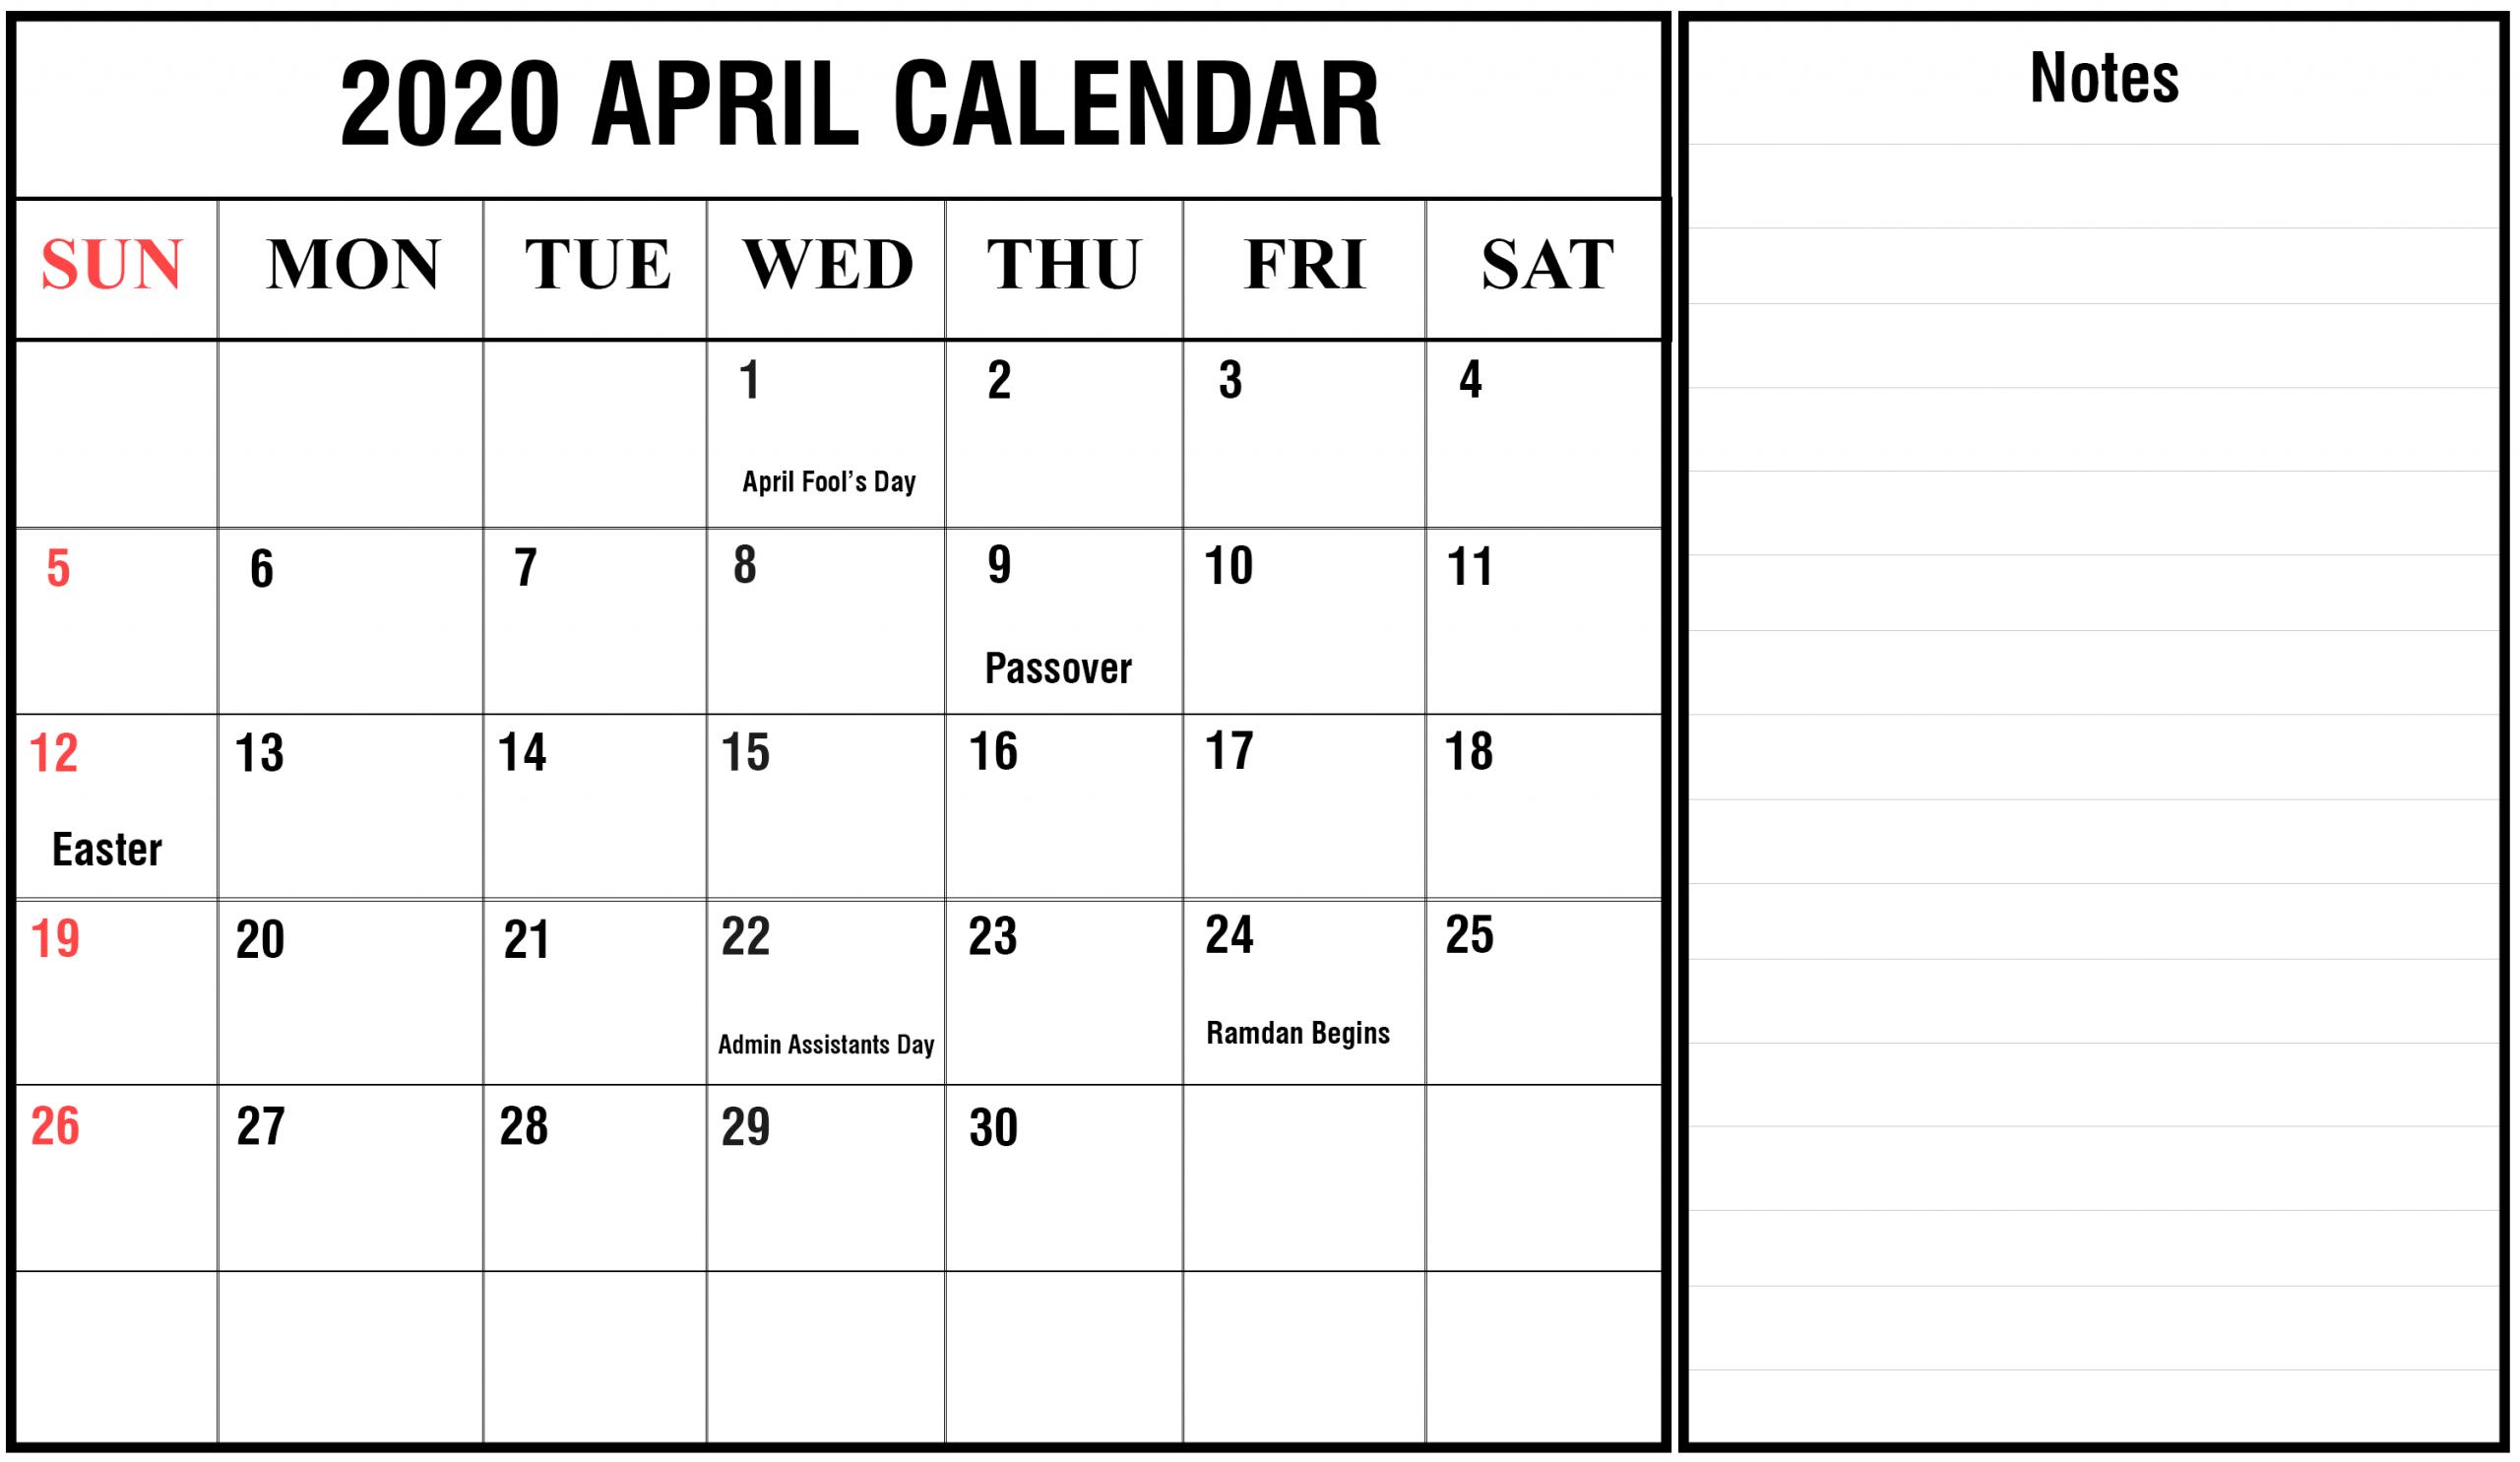 Calendars You Can Edit :-Free Calendar Template Free Calendars That I Can Edit And Print